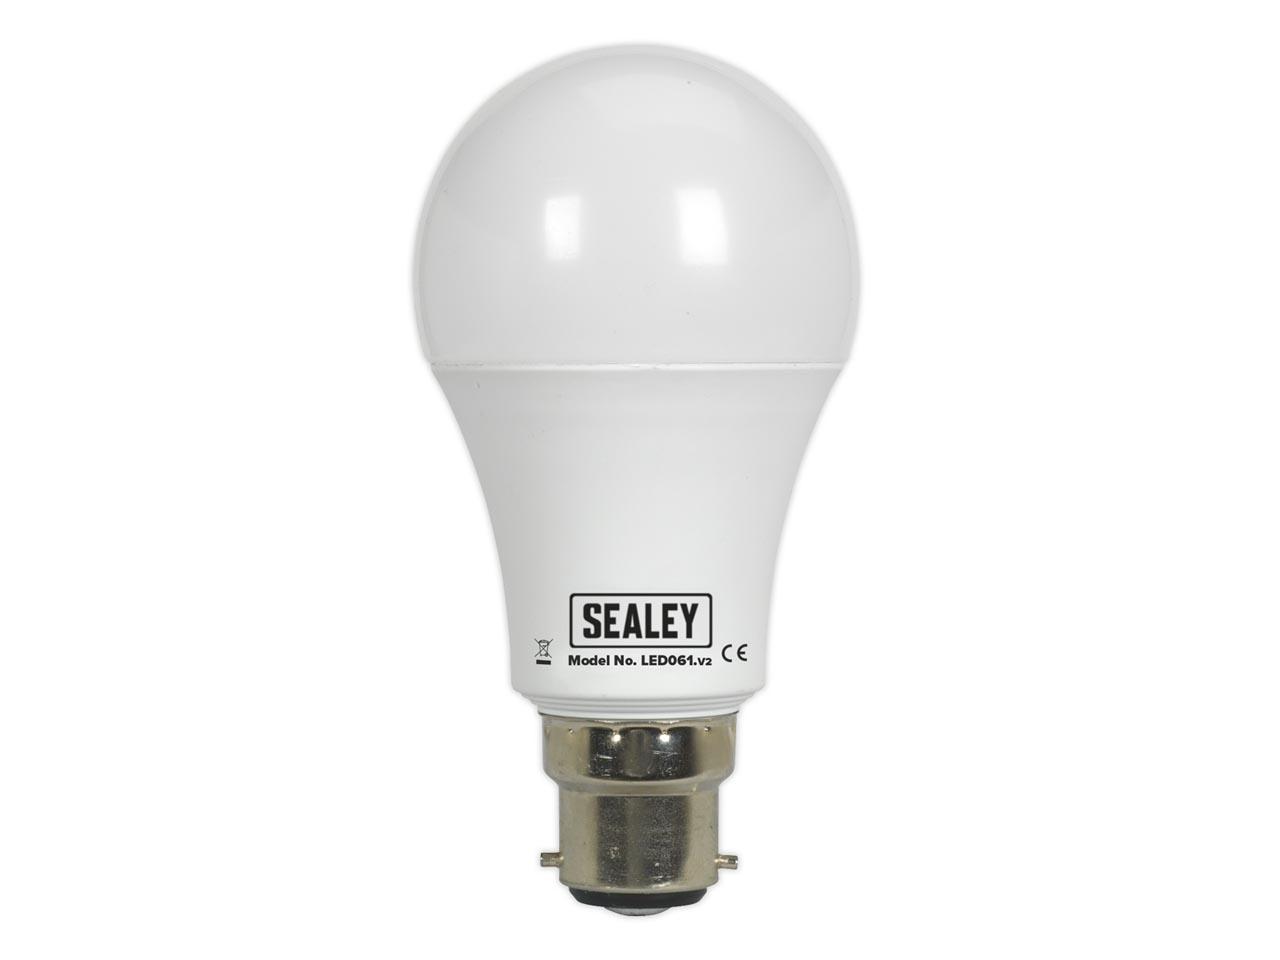 Sealey_LED061v2.jpg